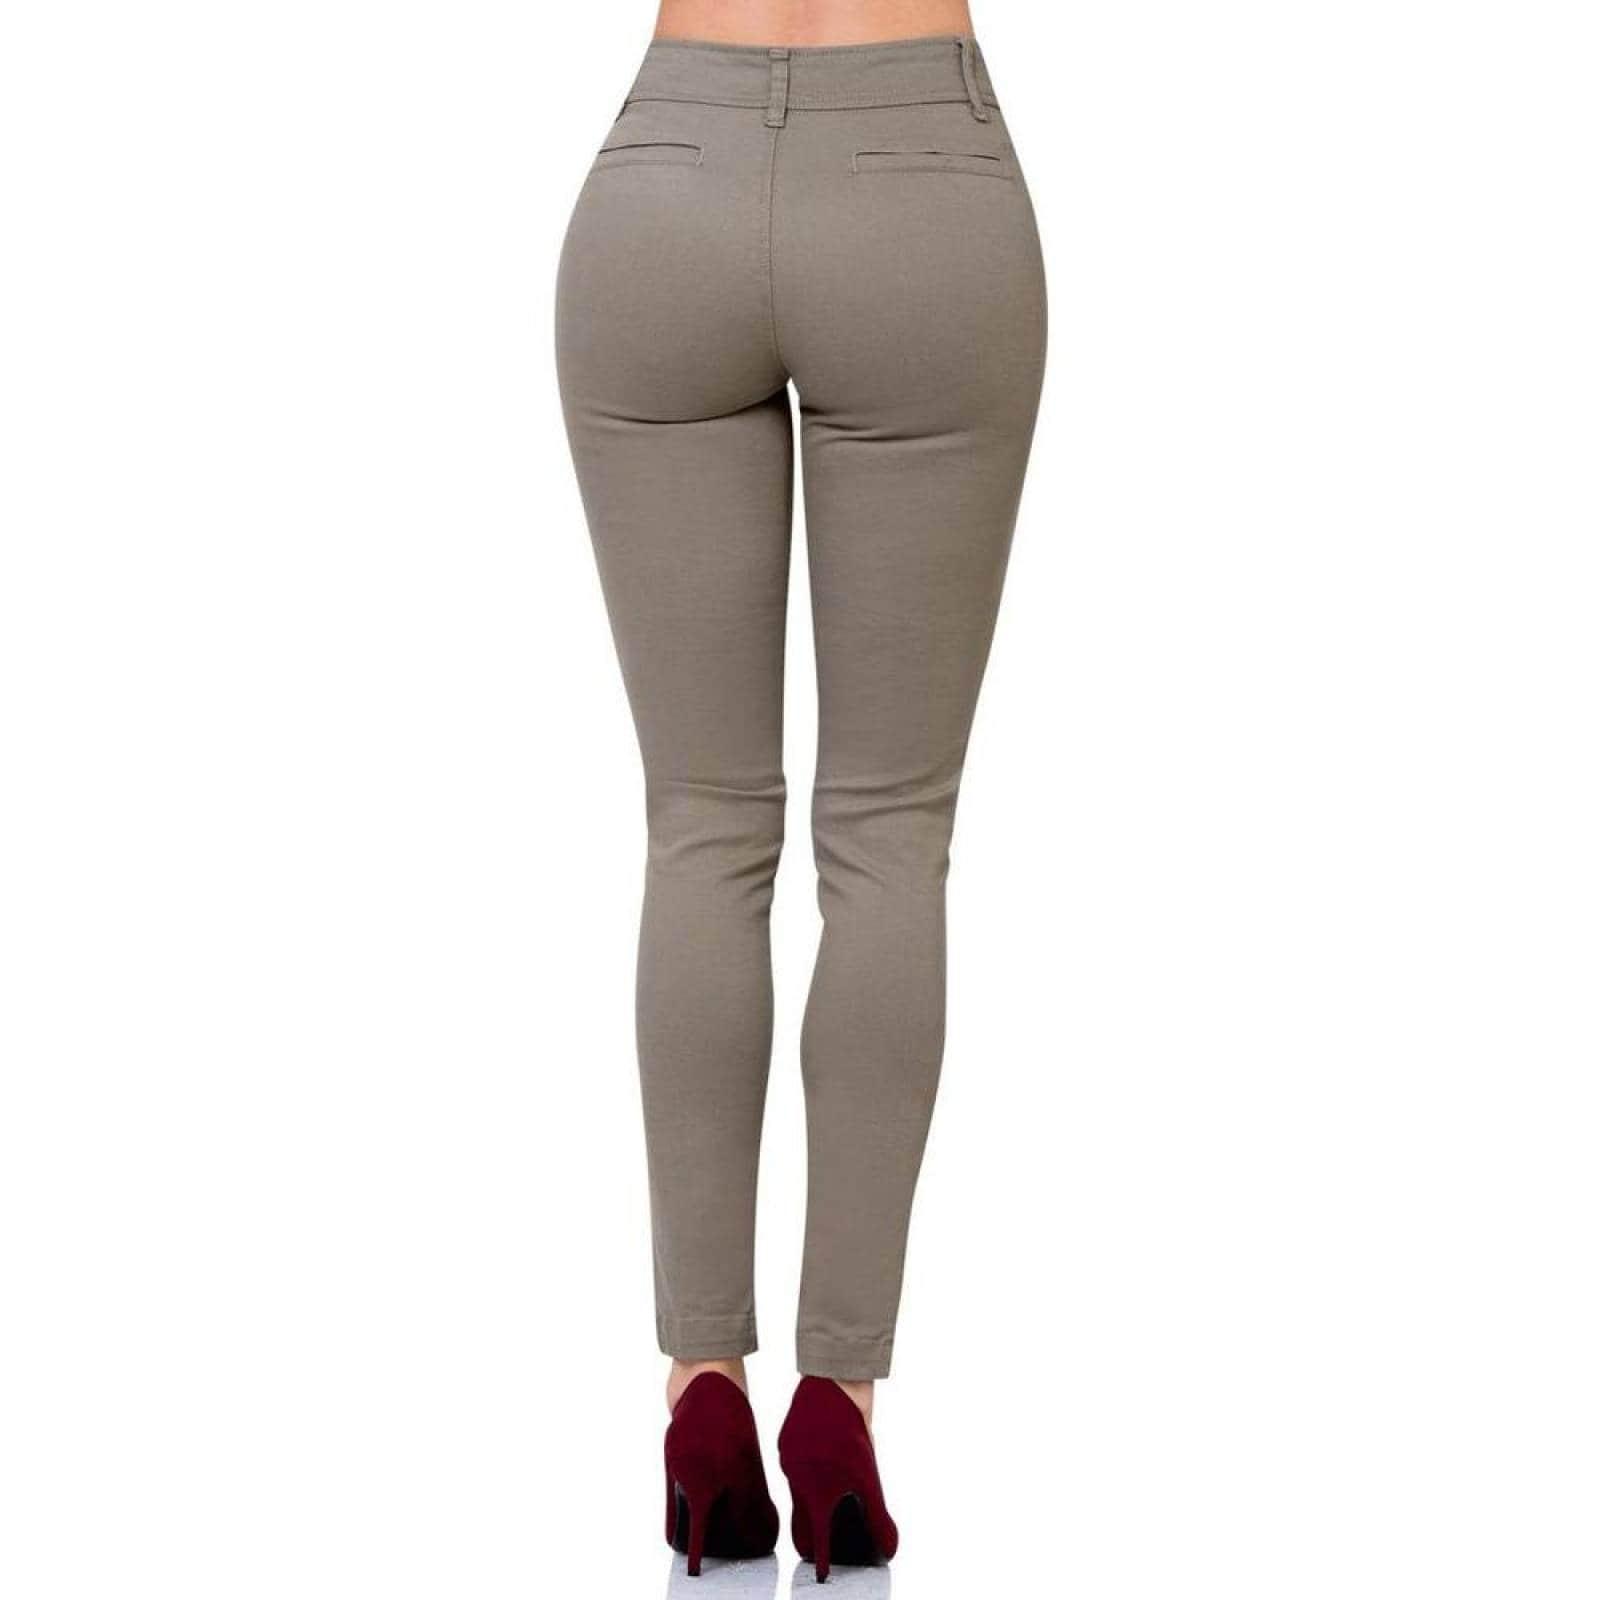 Pantalon Casual Mujer Scandia Khaki 65003000 Gabardina Stretch